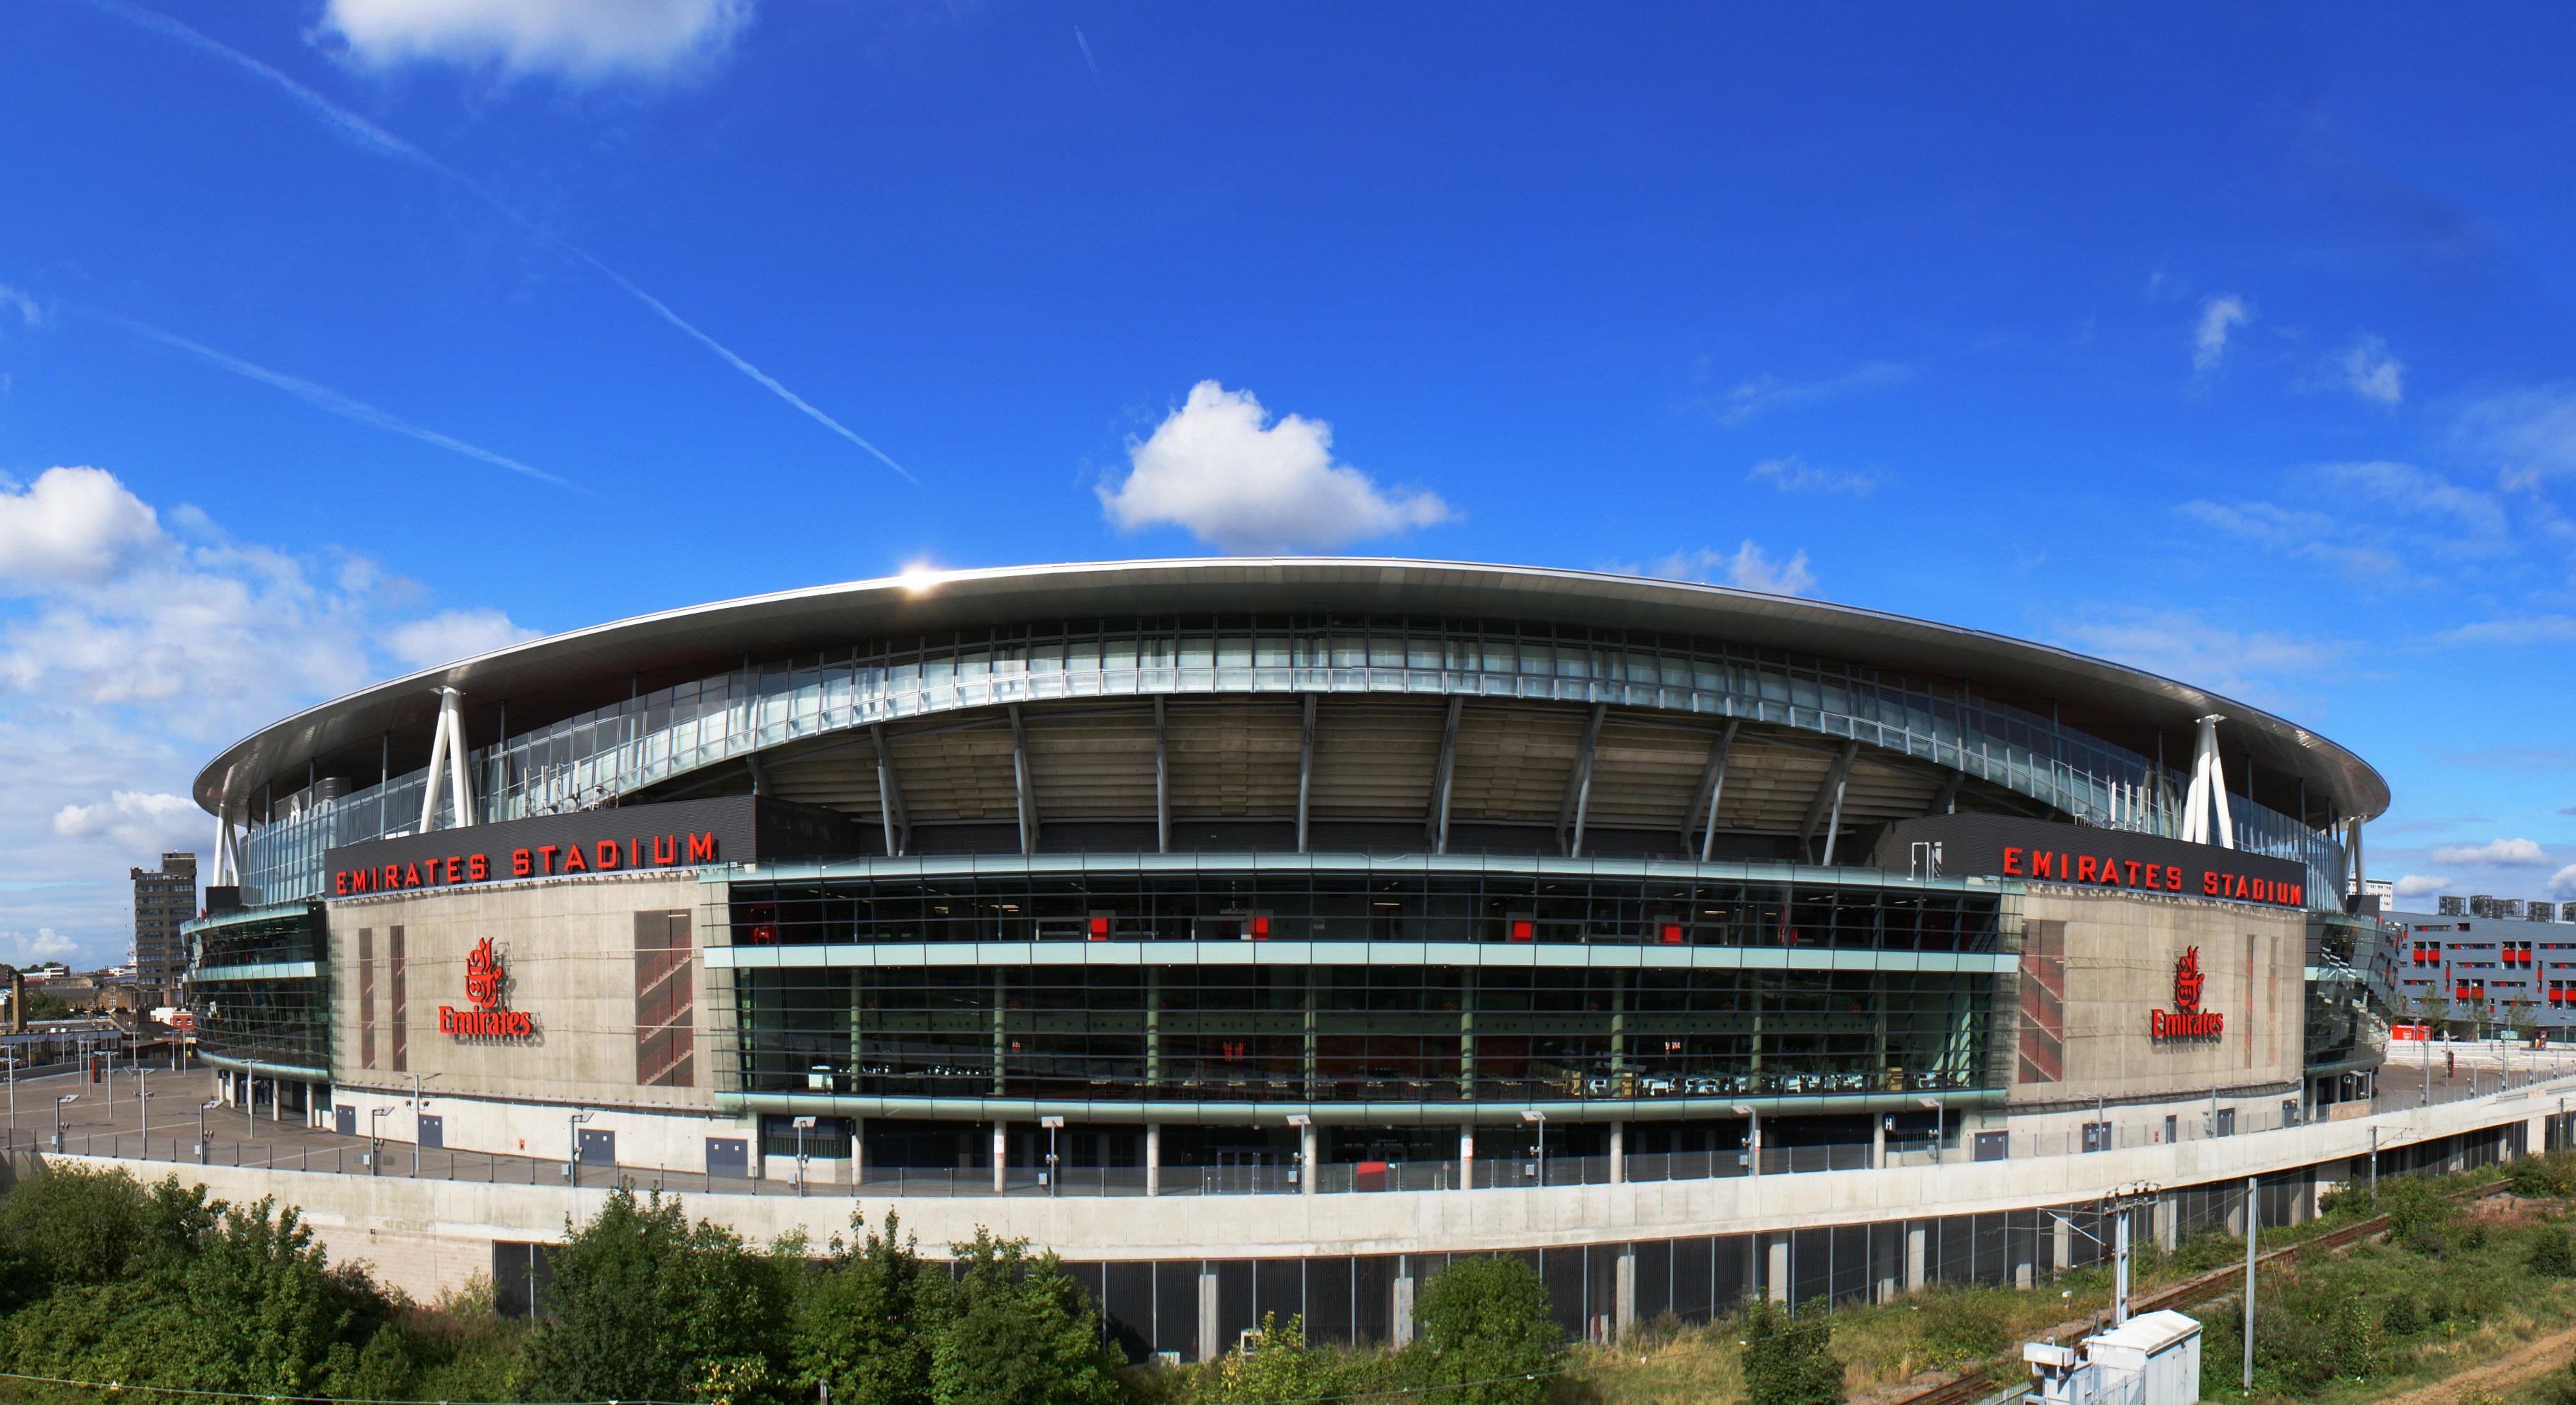 Arsenal Emirates Stadium Wallpaper HD 3636x1983